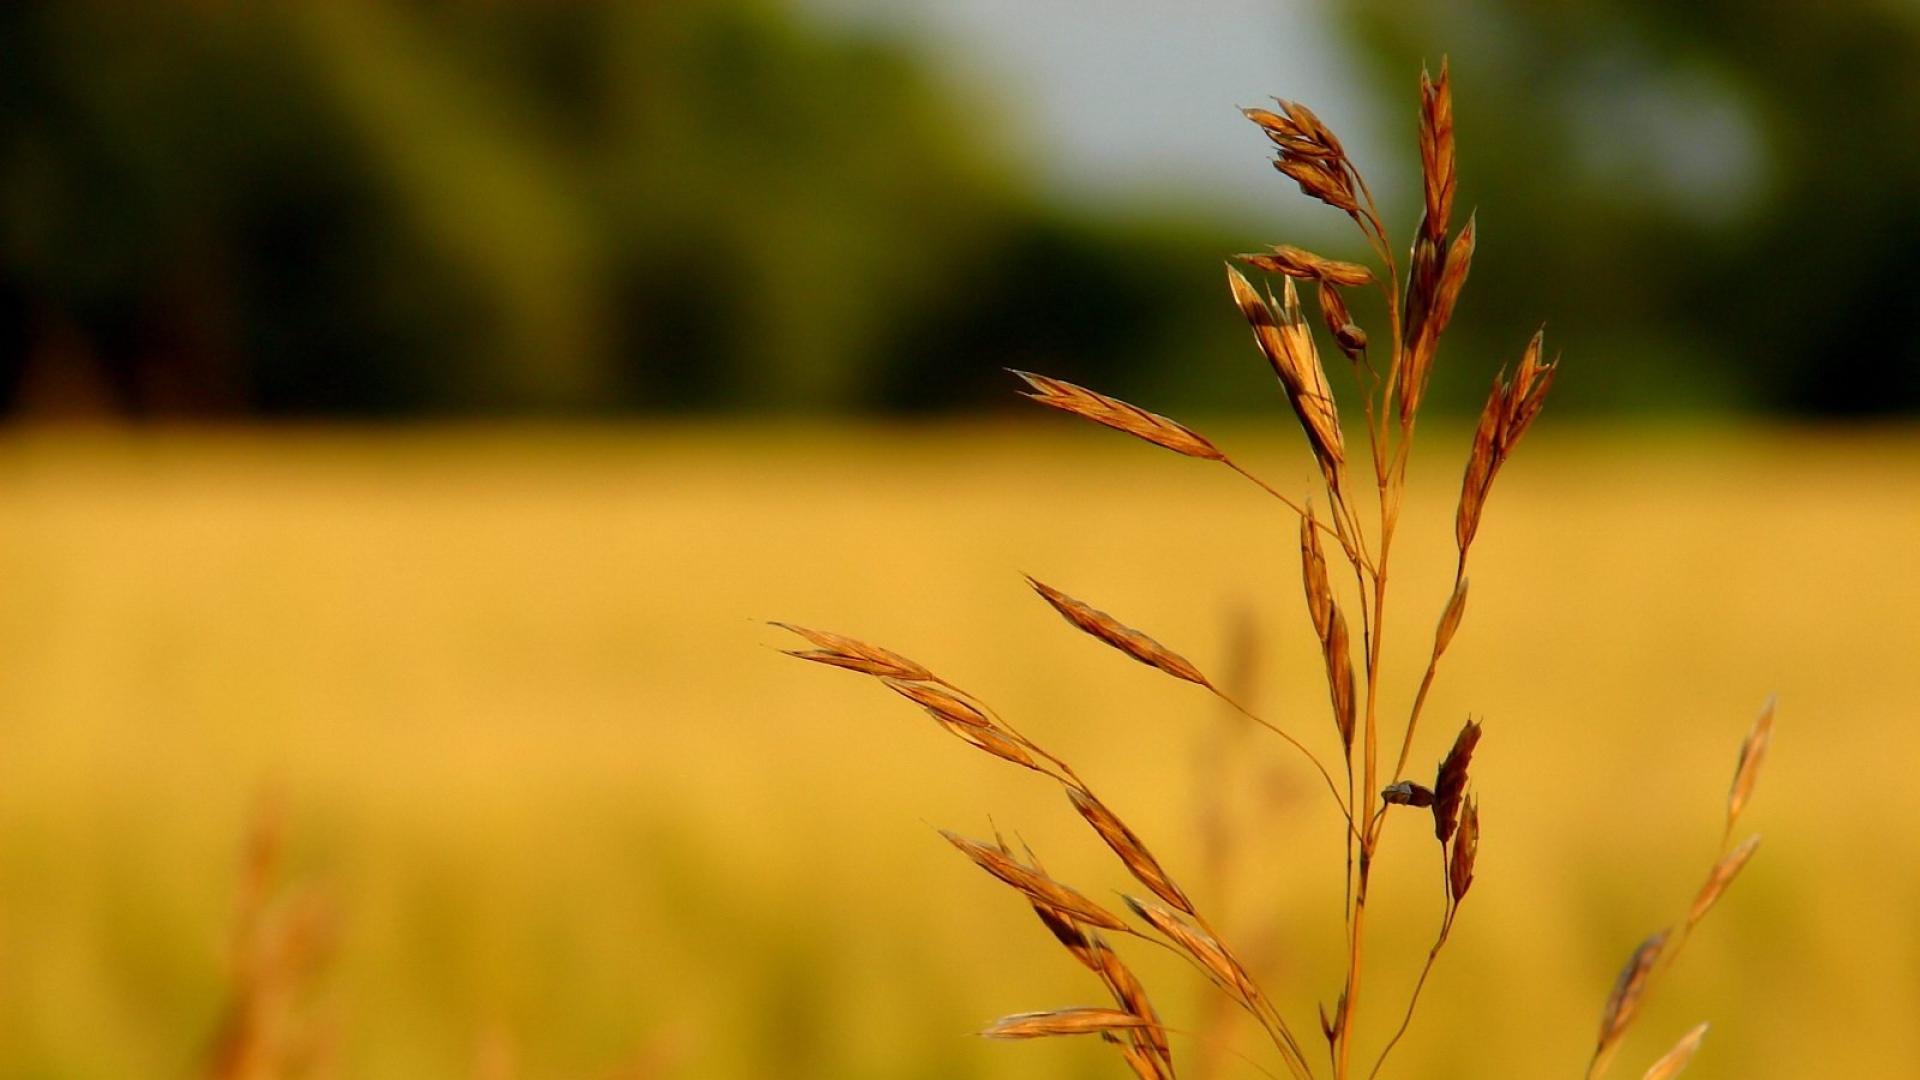 Download Wallpaper 1920x1080 Grass Dry Field Branch Full Hd